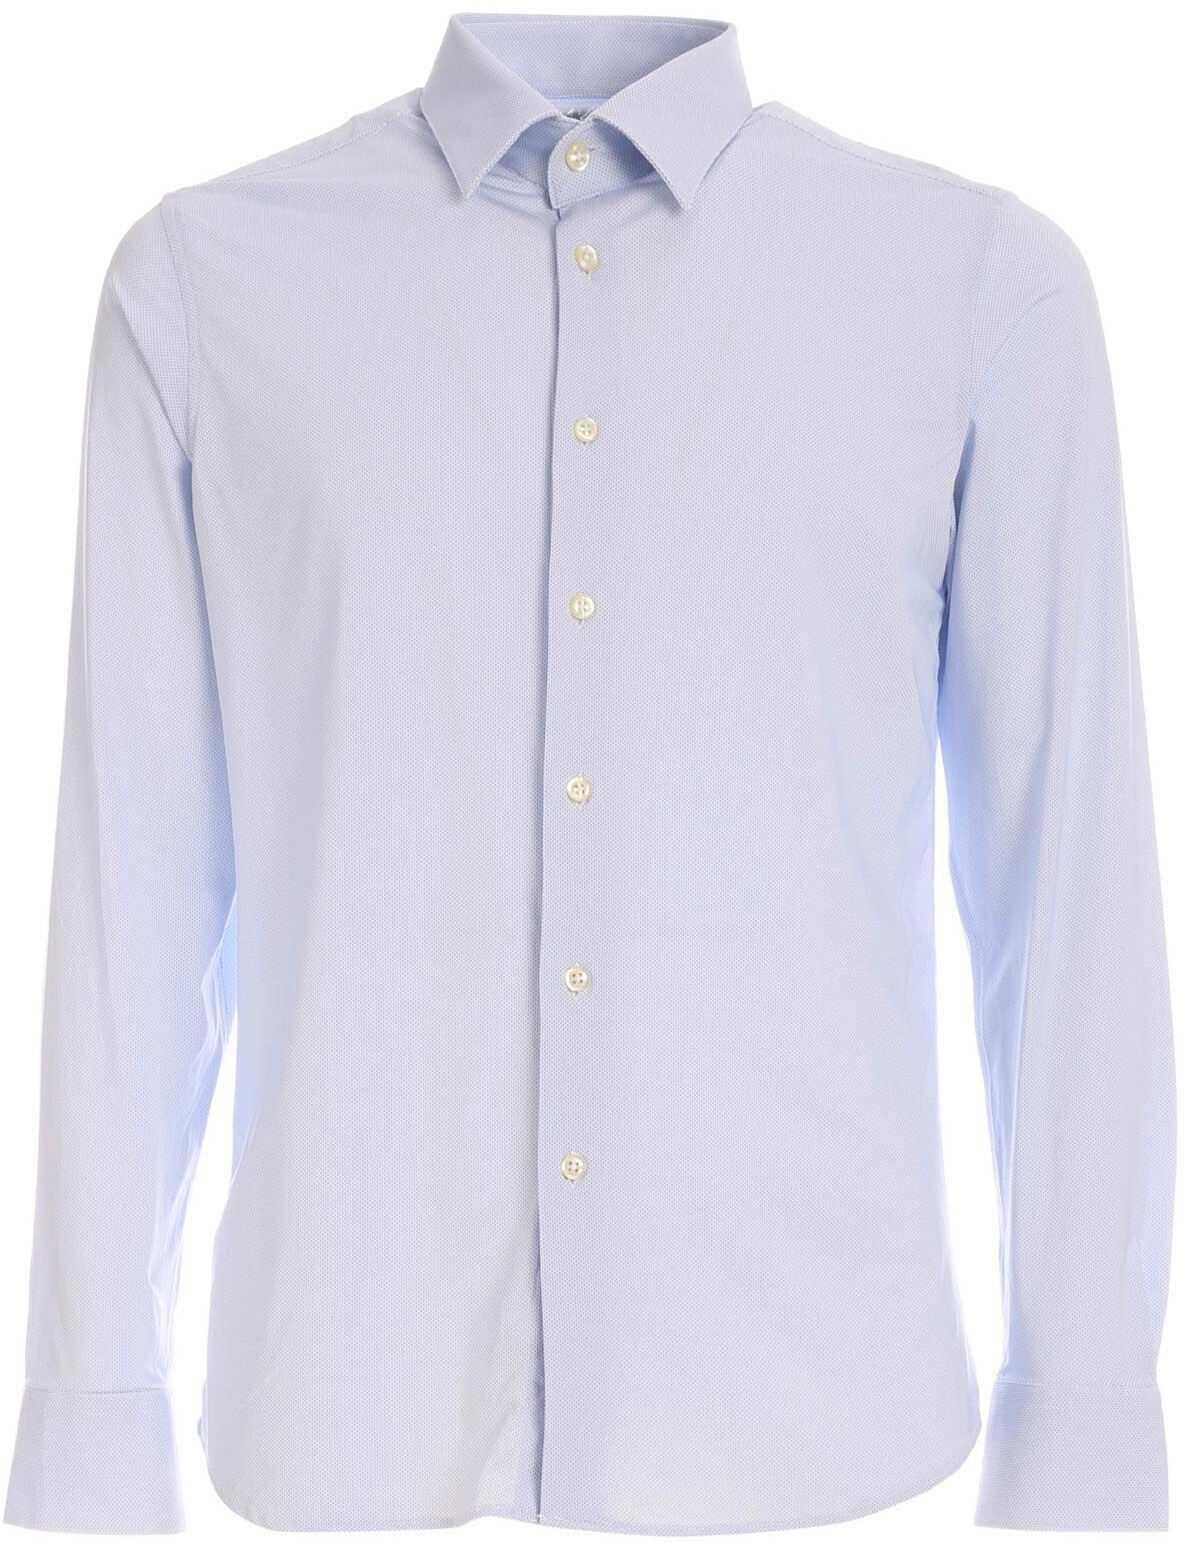 RRD Roberto Ricci Designs Micro Pattern Shirt In Light Blue Light Blue imagine